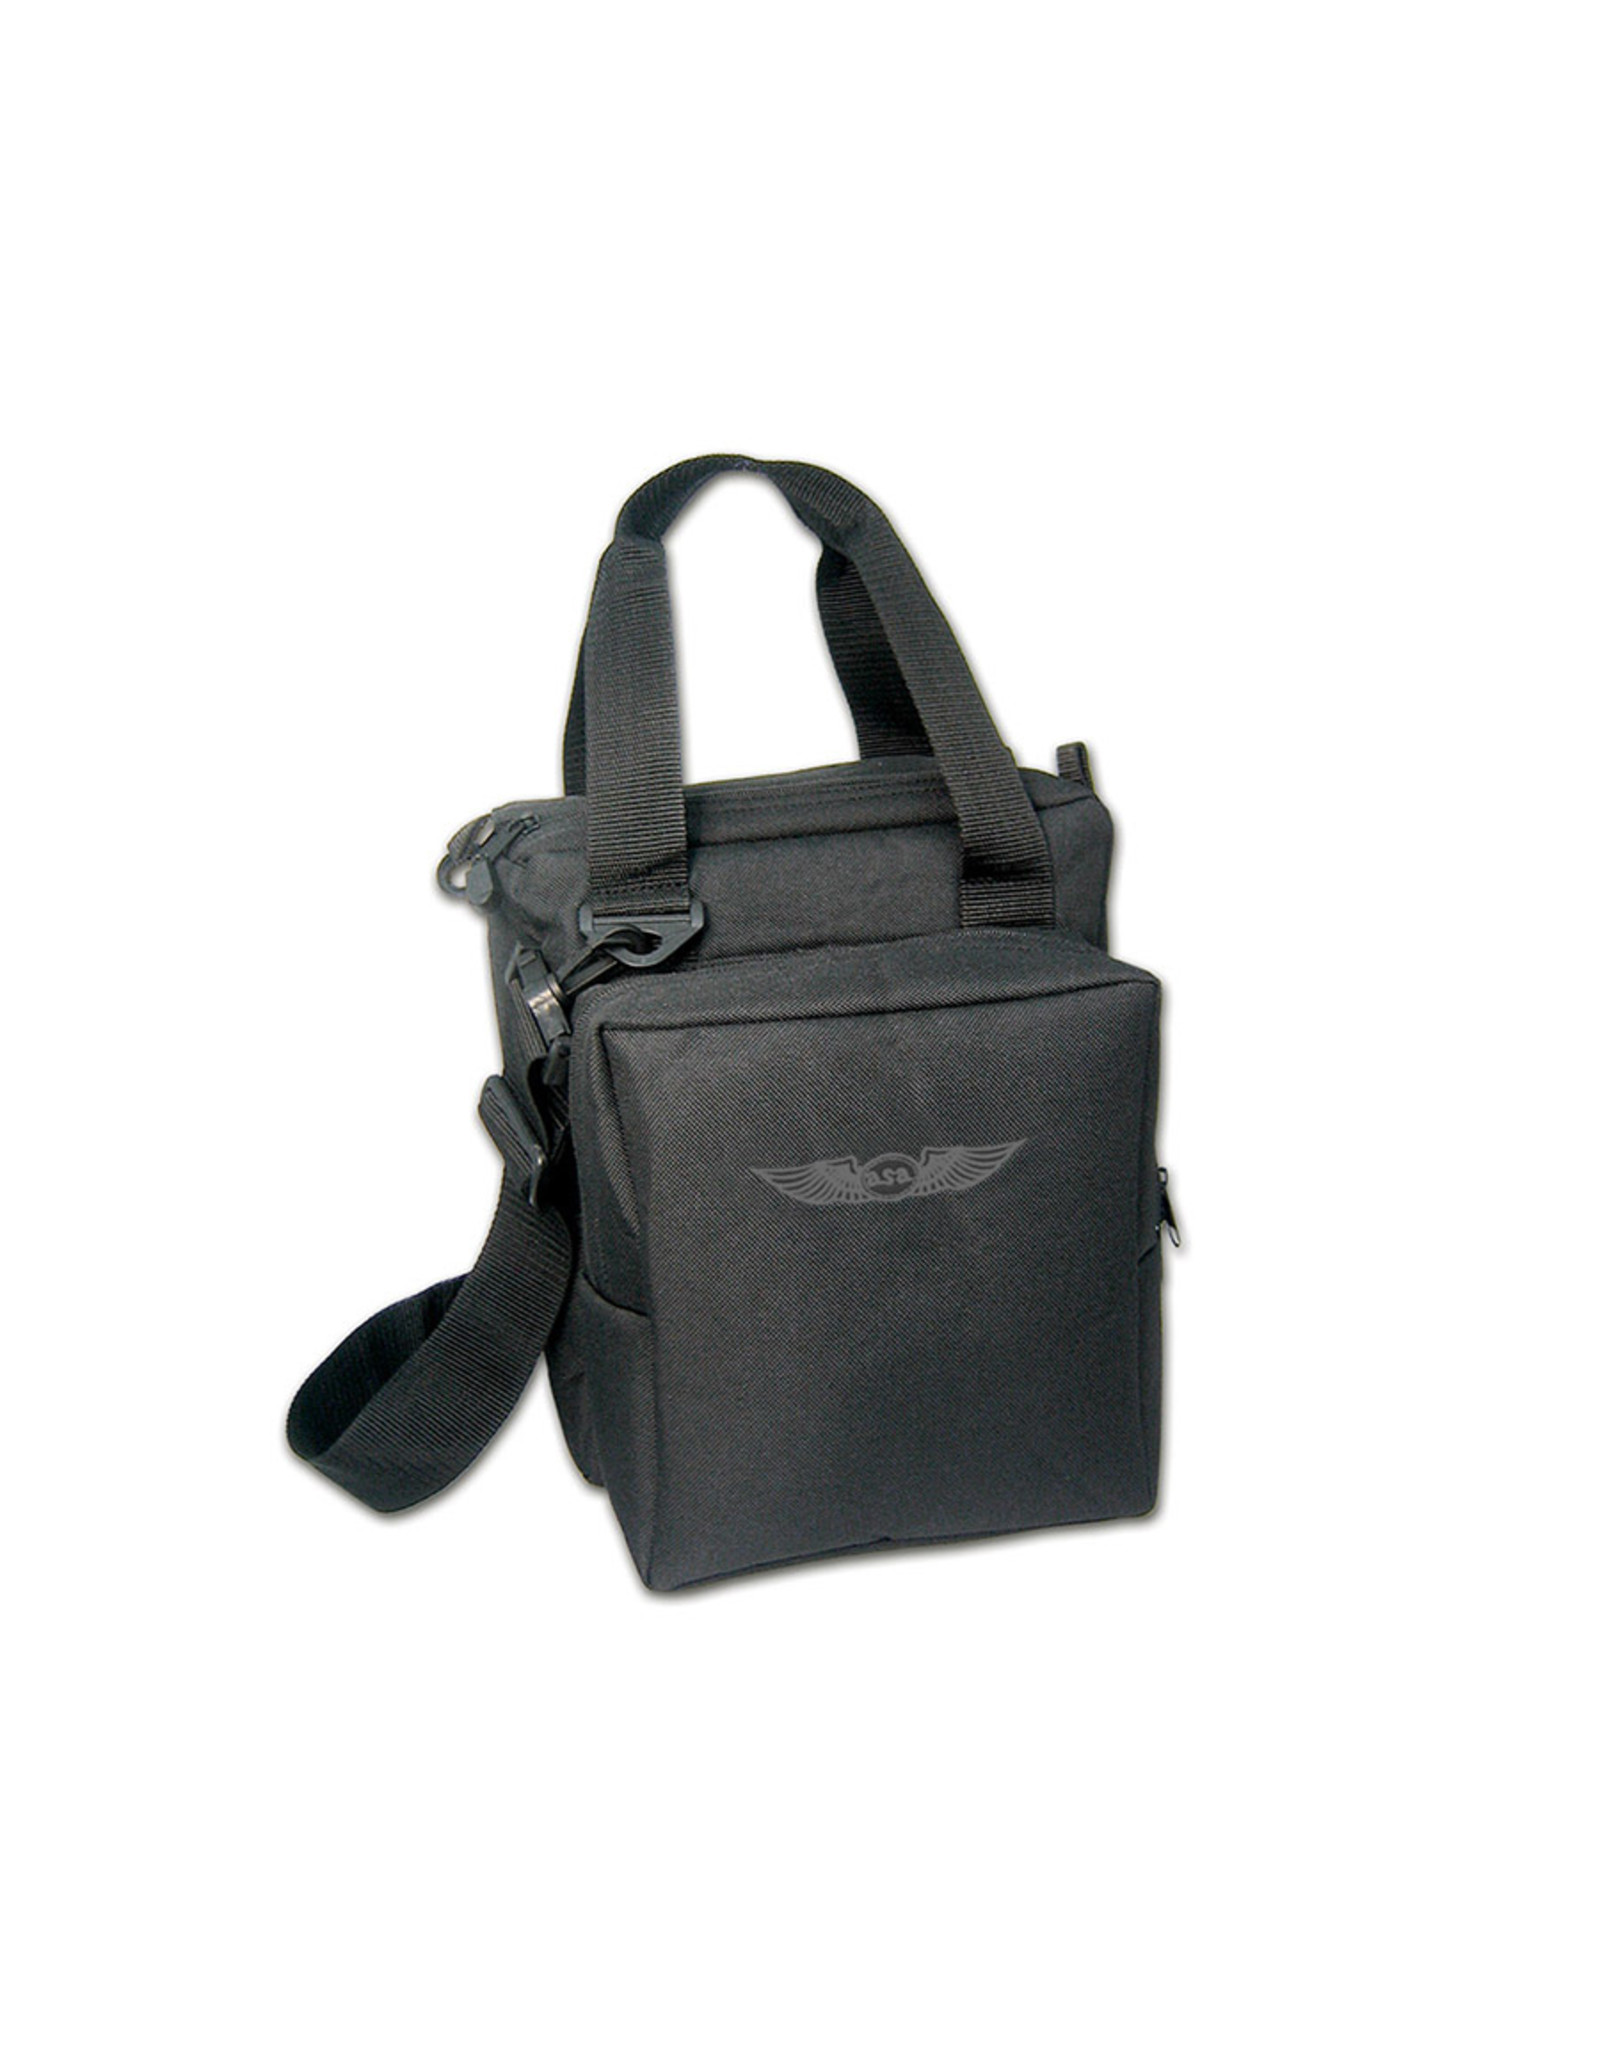 ASA AirClassics Pilot Bag